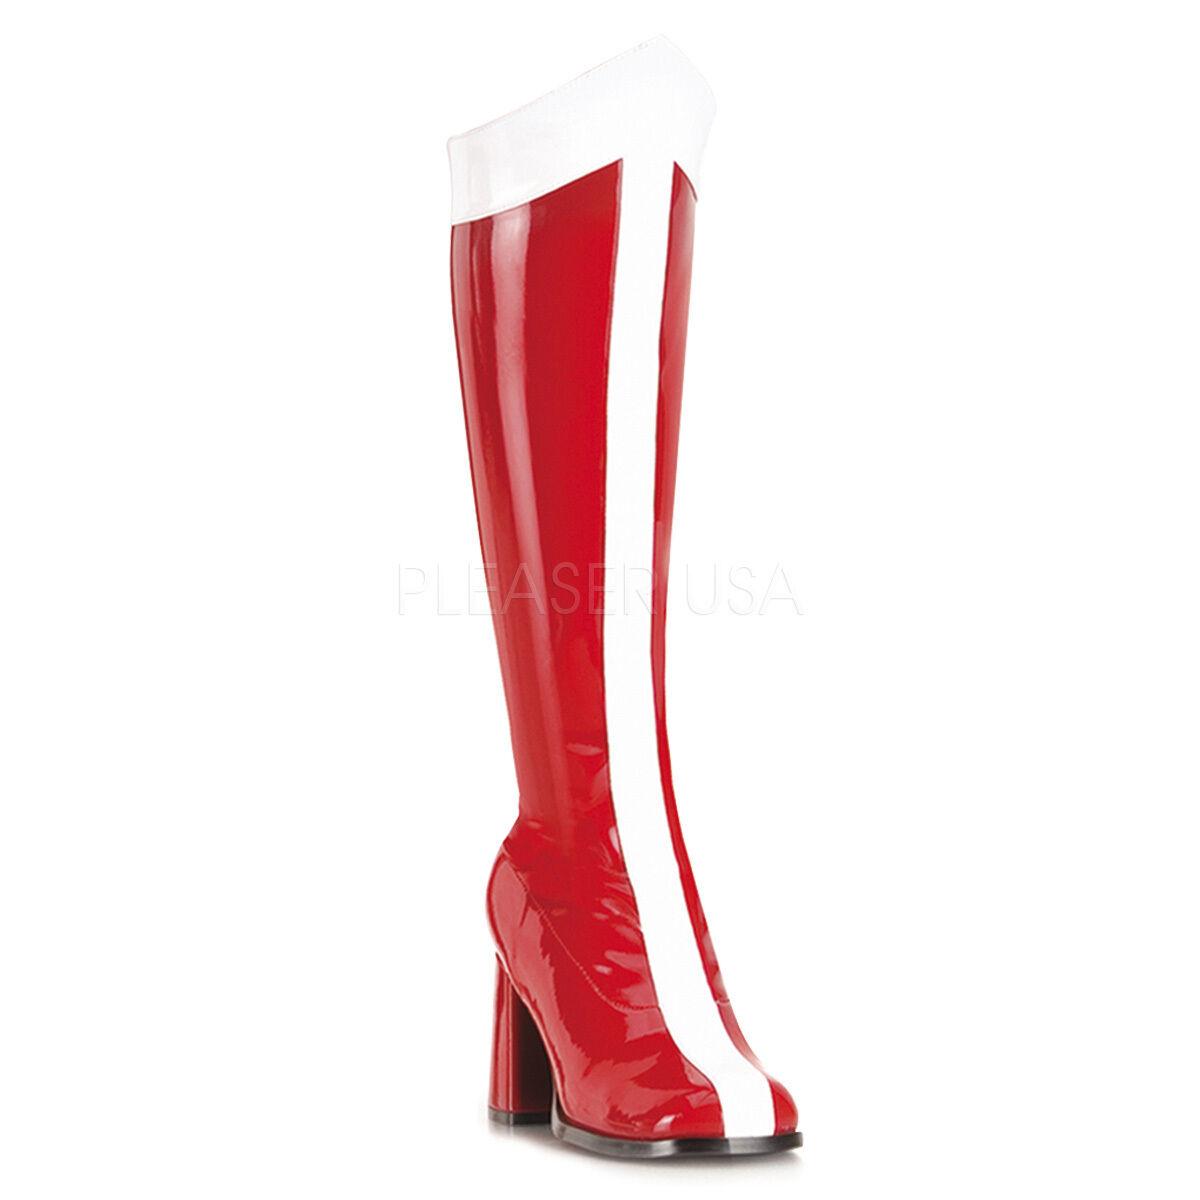 PLEASER FUNTASMA GOGO 305 FANCY DRESS WONDER WOMAN LOW HEEL KNEE Stiefel HERO